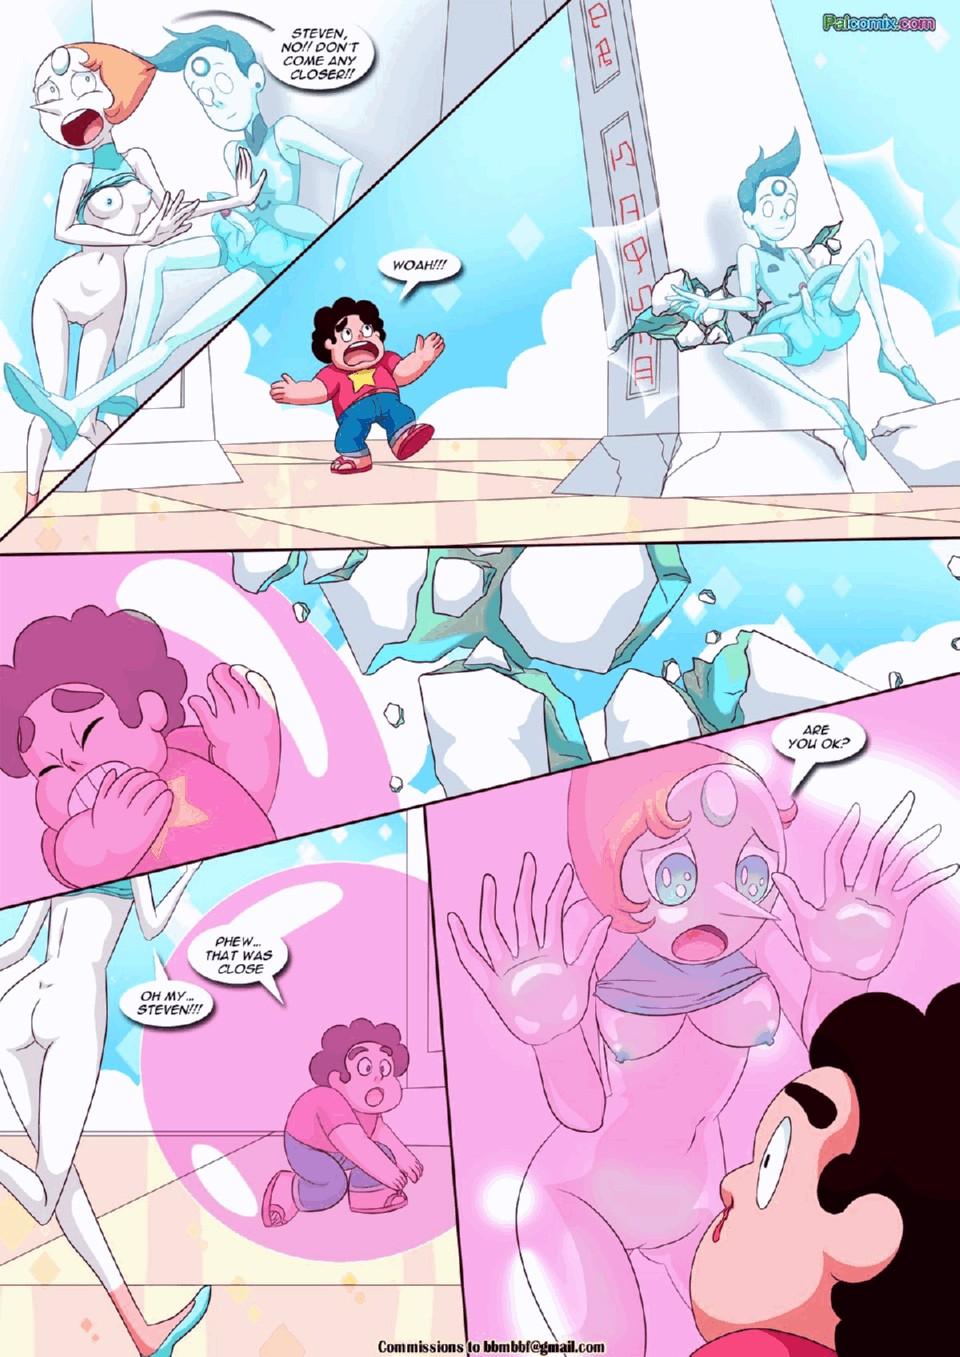 Rose's memories porn comic page 005